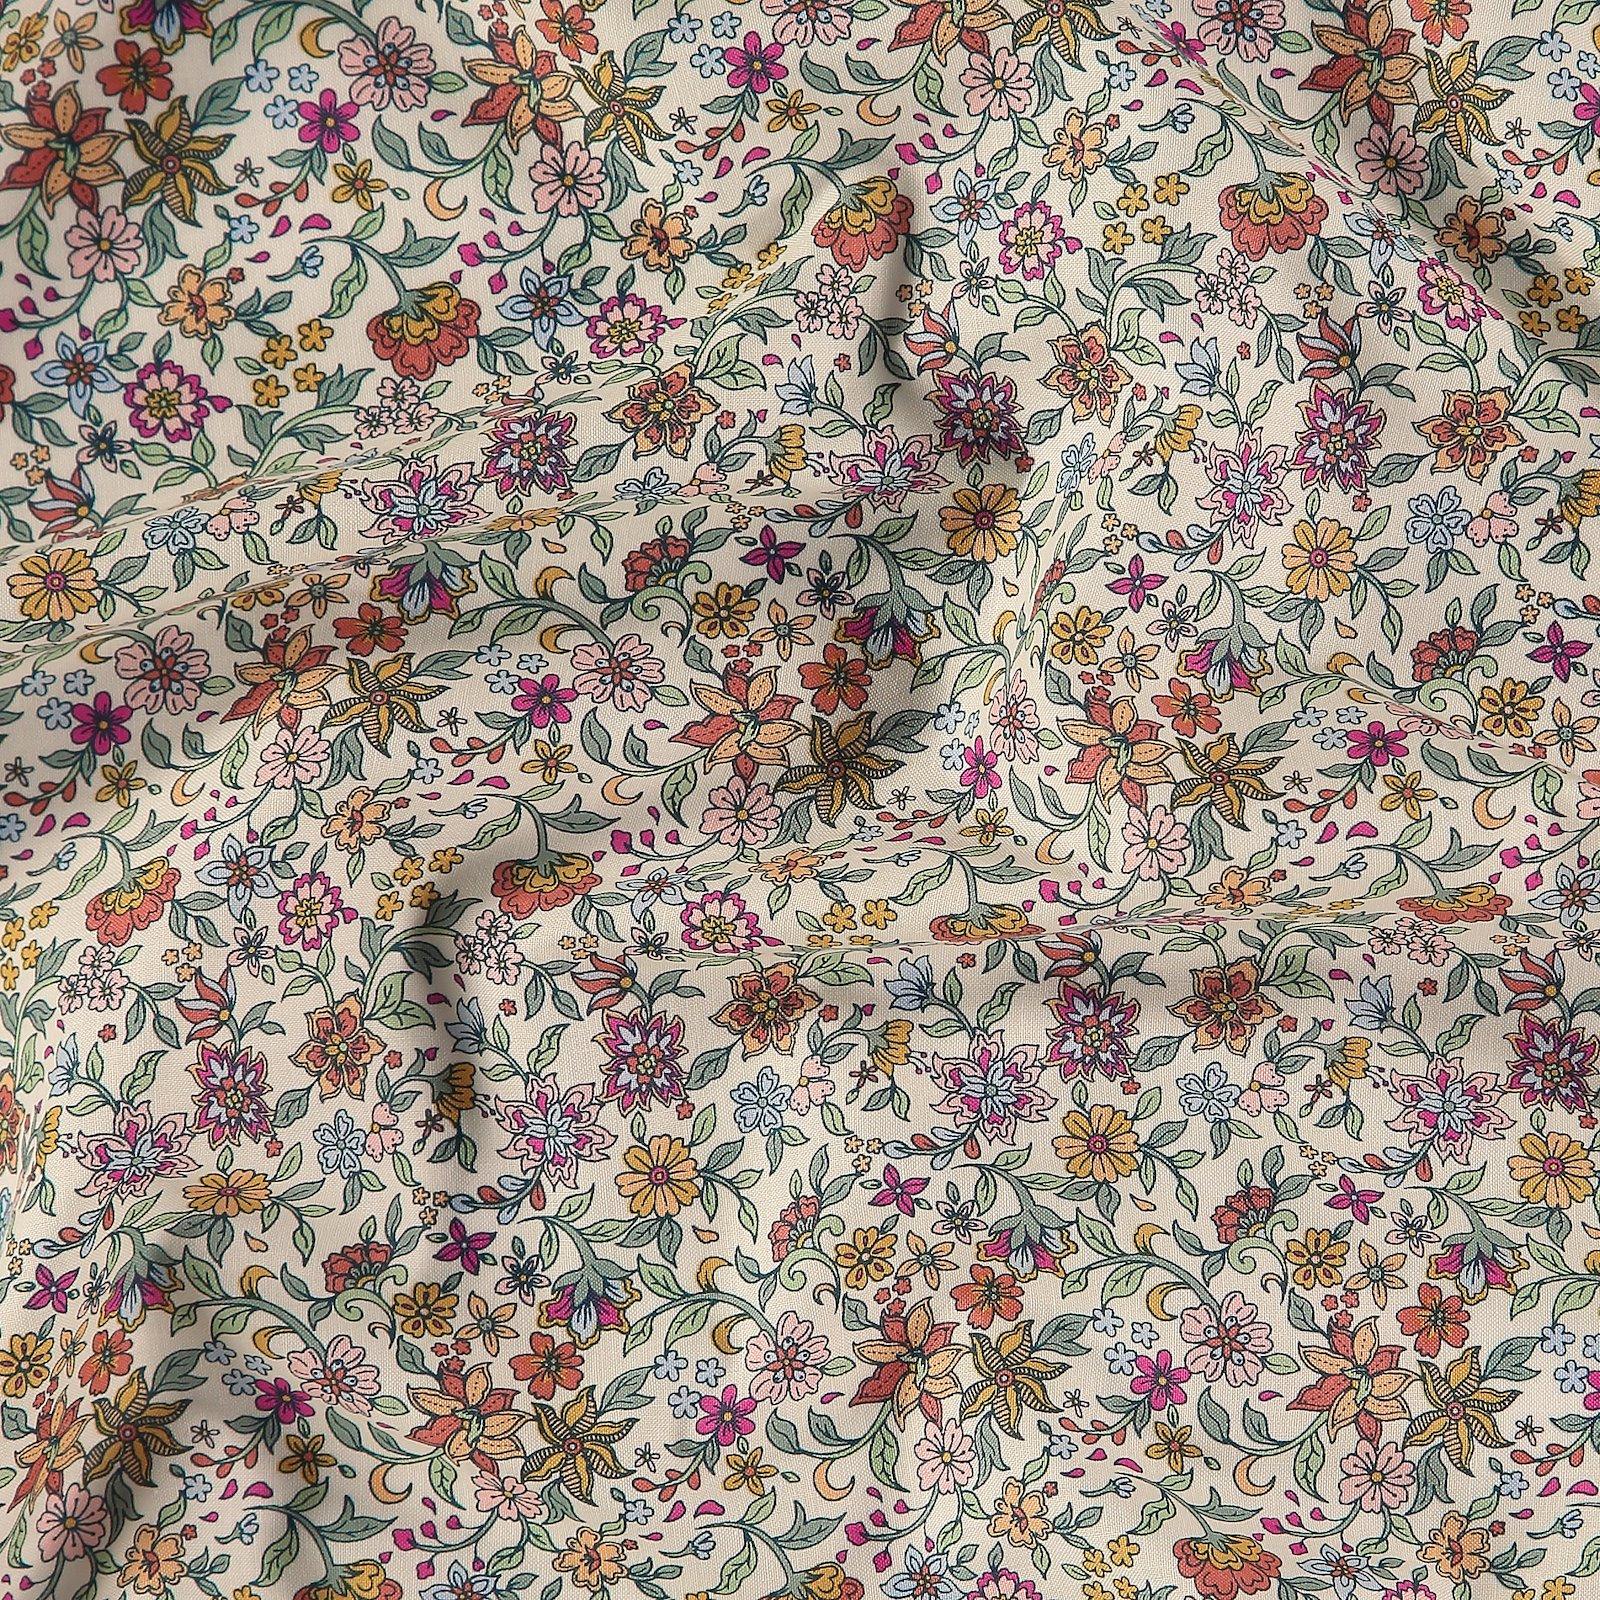 Cotton pastel powder w flowers